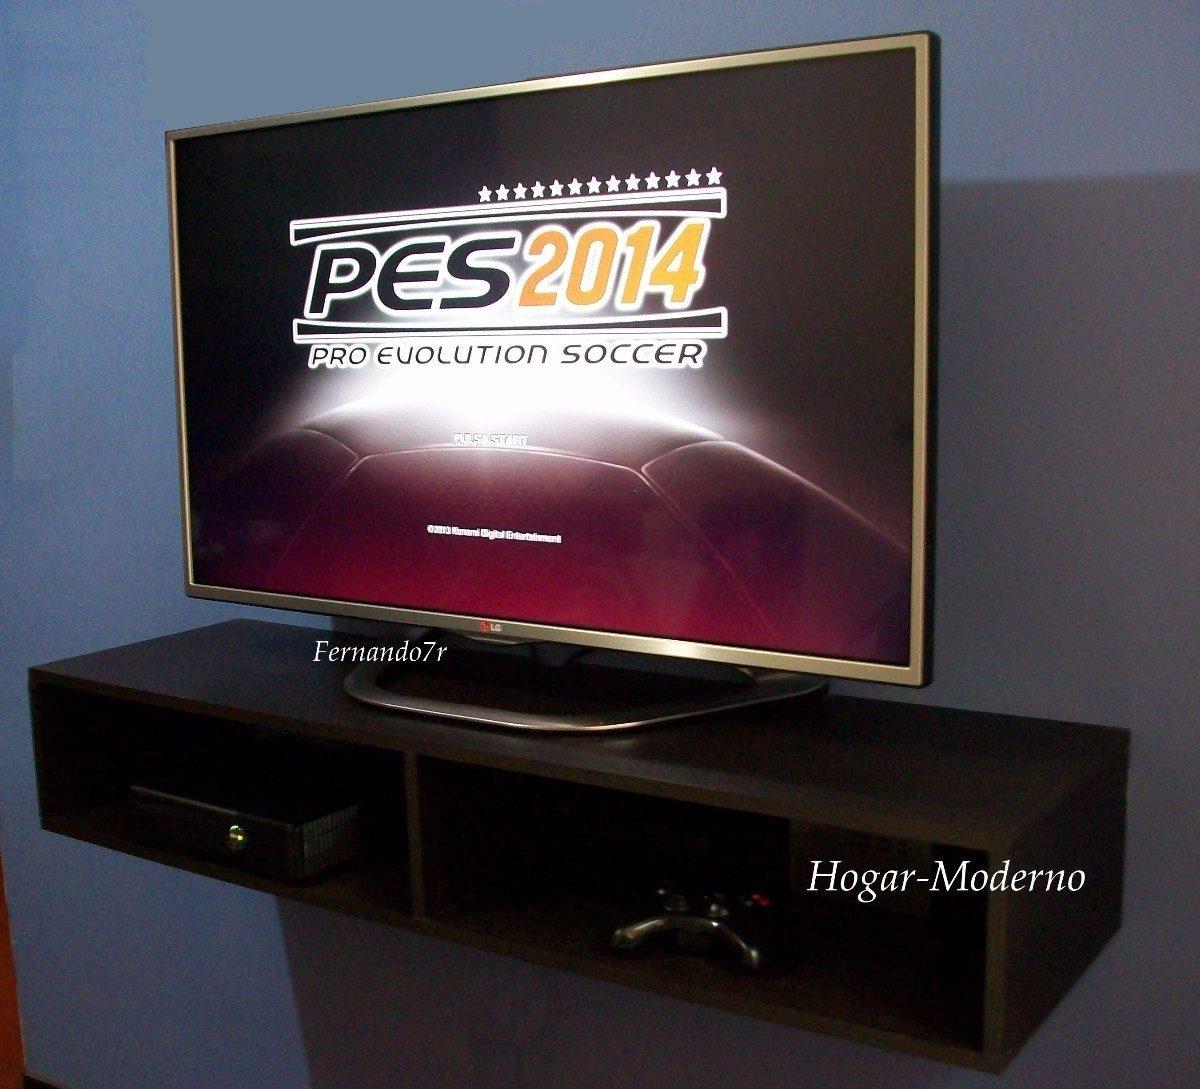 soporte base flotante para tv 120cm en mercado. Black Bedroom Furniture Sets. Home Design Ideas